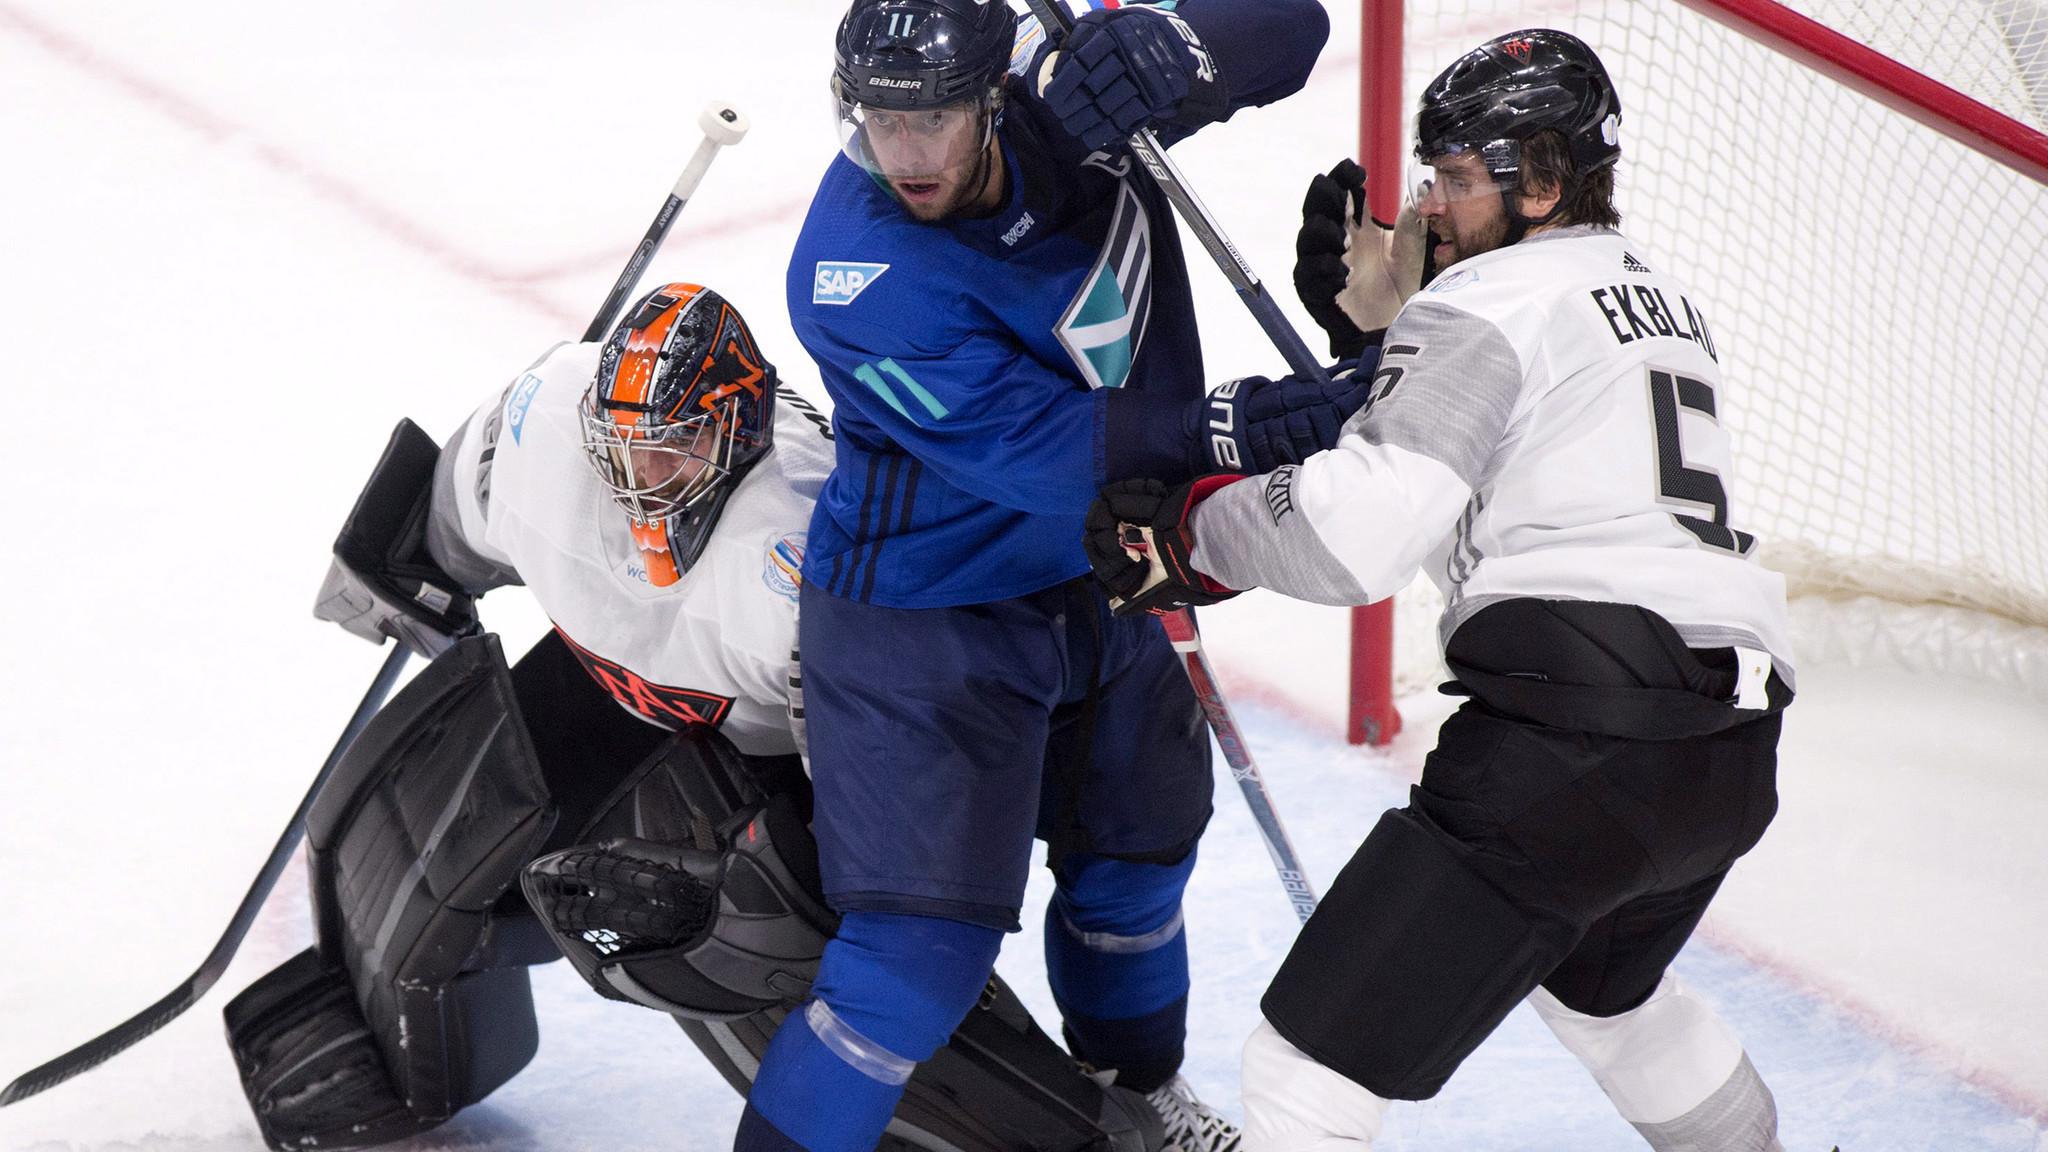 La-sp-sn-world-cup-hockey-matt-murray-092416-20160924-snap